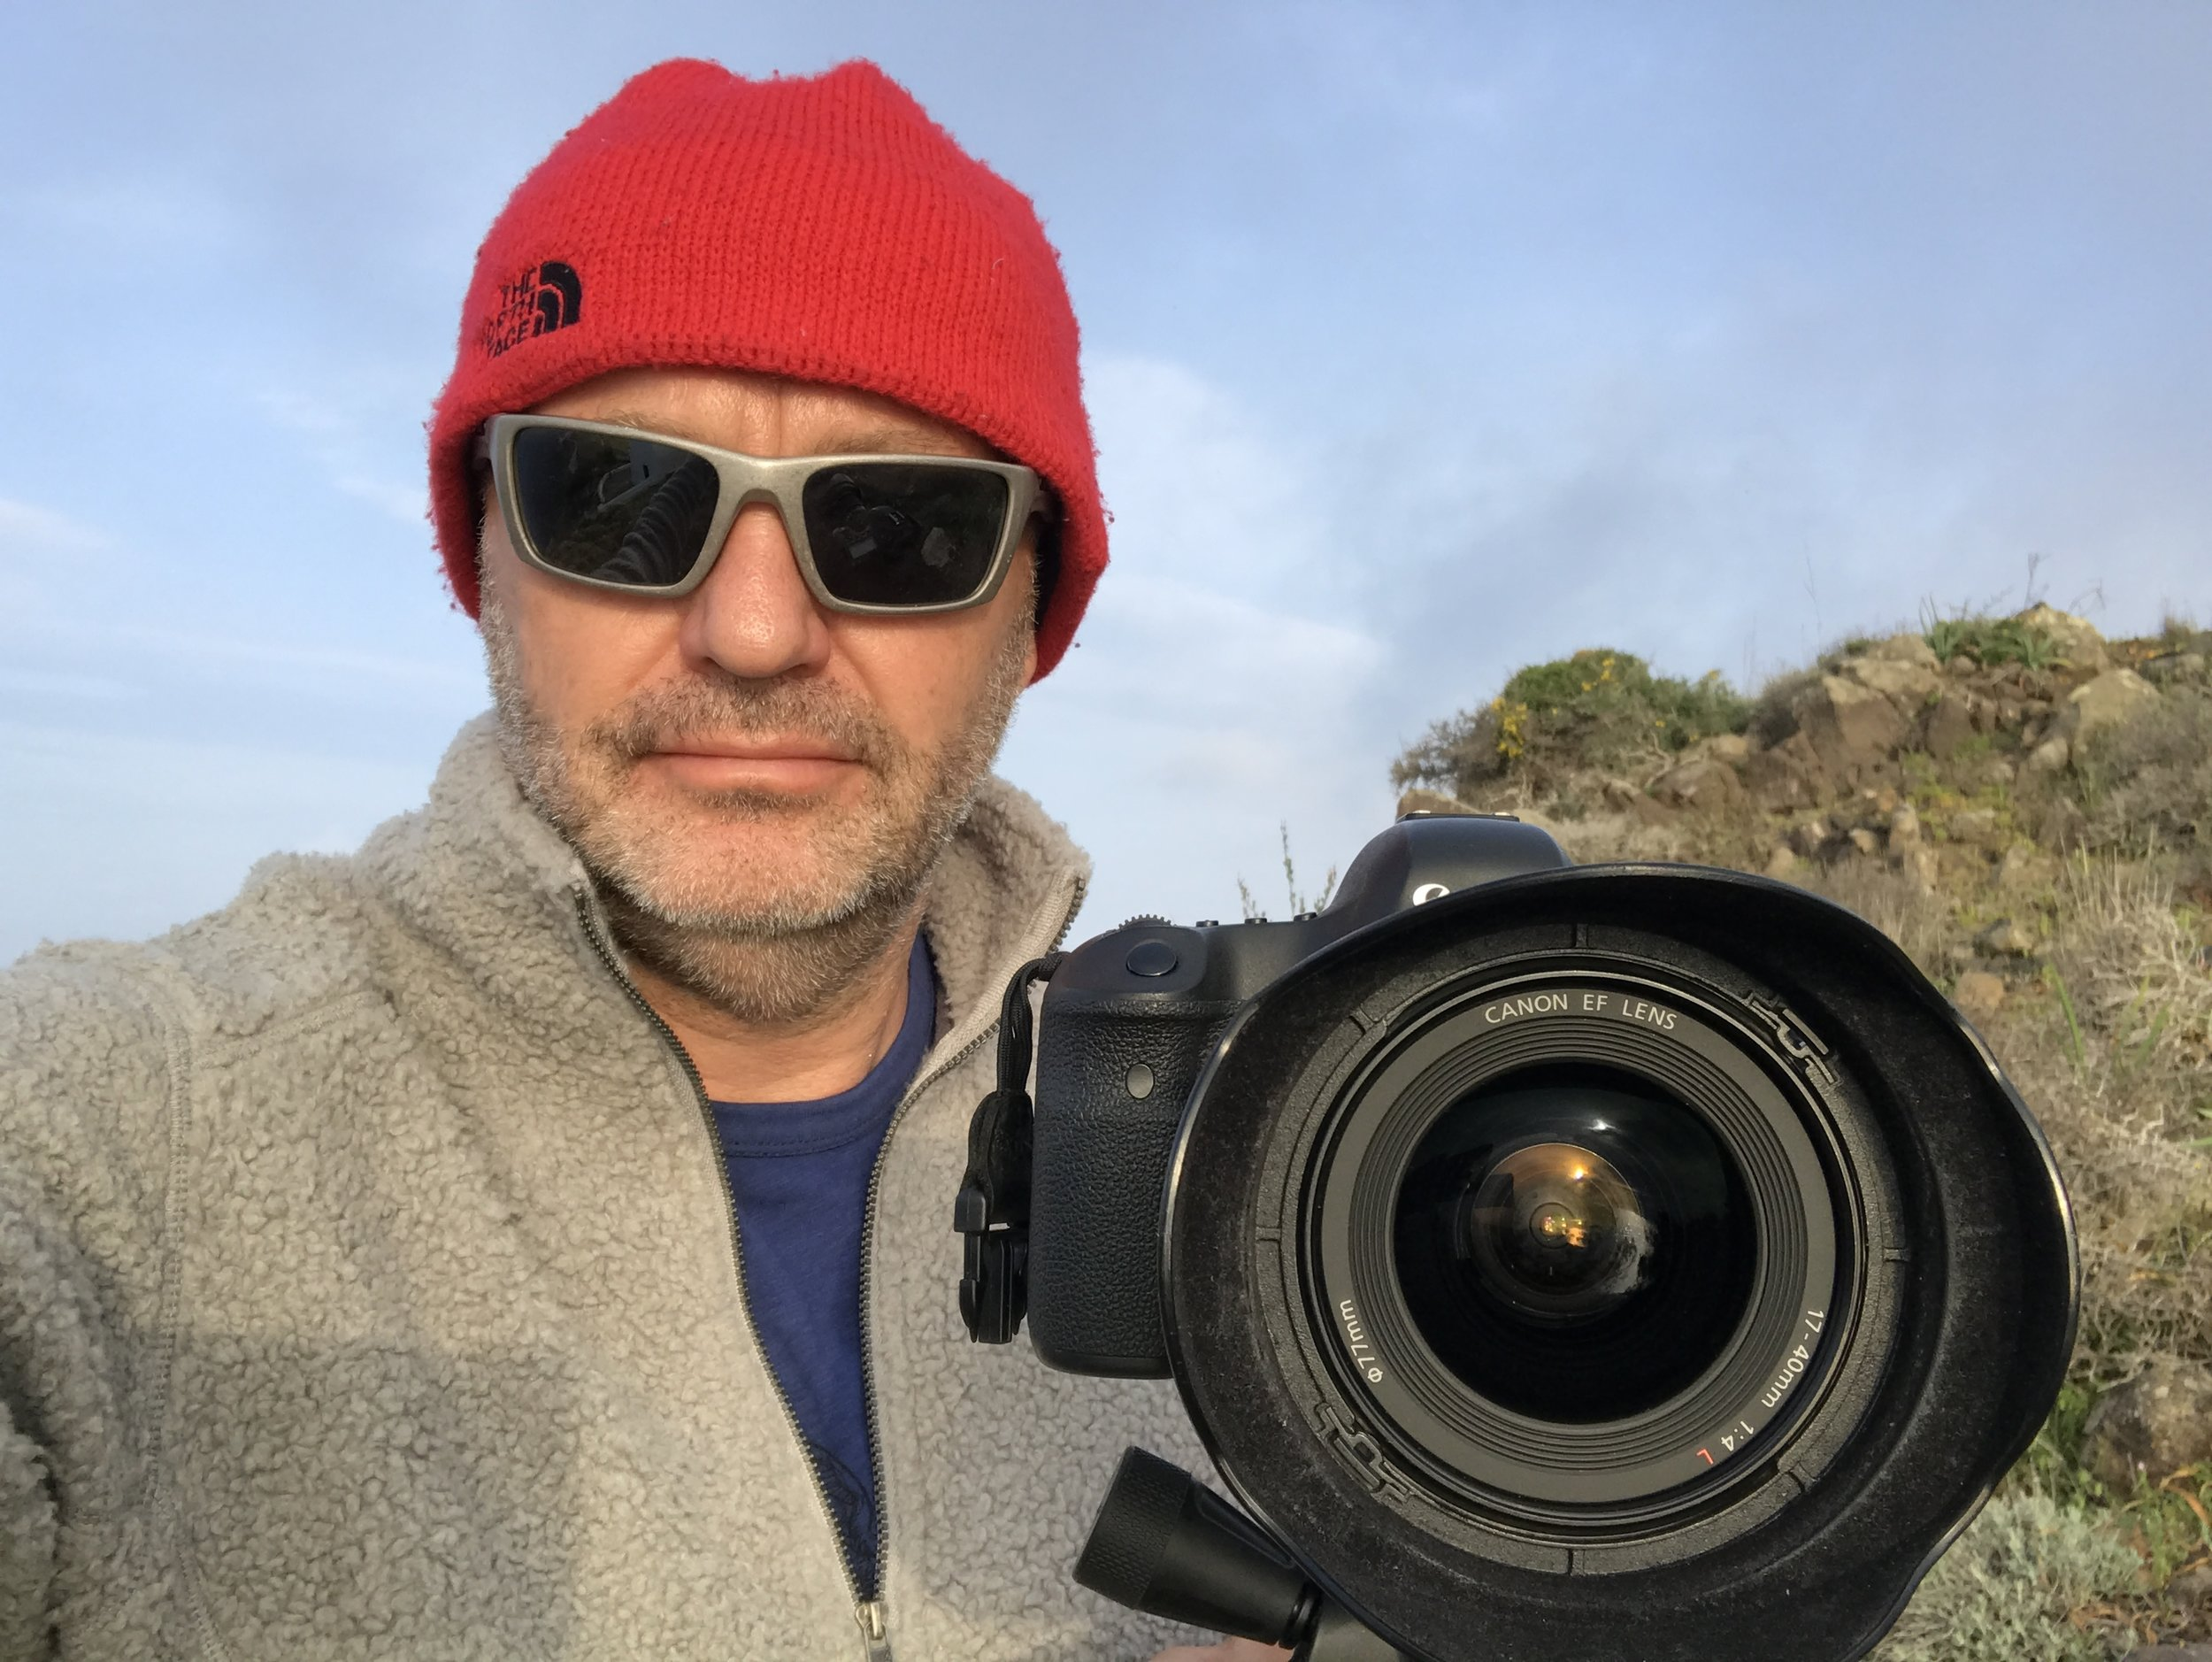 Me in my happy place taking photos in Santorini IMG_8467.JPG